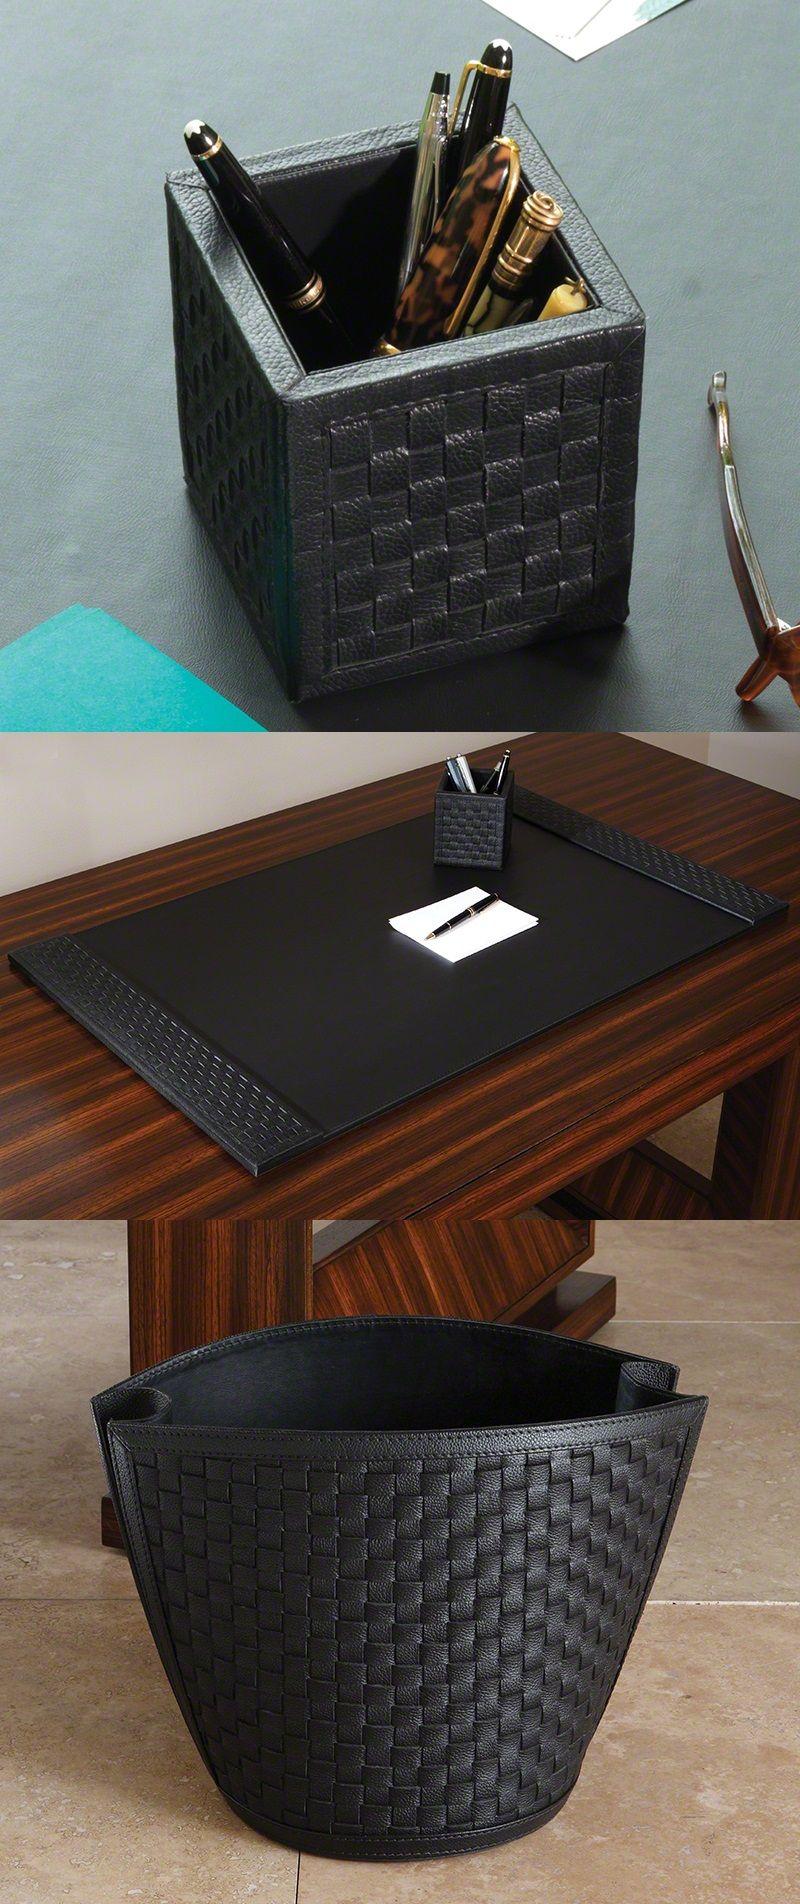 Desk Accessories Desk Sets Desk Decoration Luxury Desk Accessories Luxury Desk Sets Luxury Desk Org Leather Office Accessories Desk Set Home Office Design